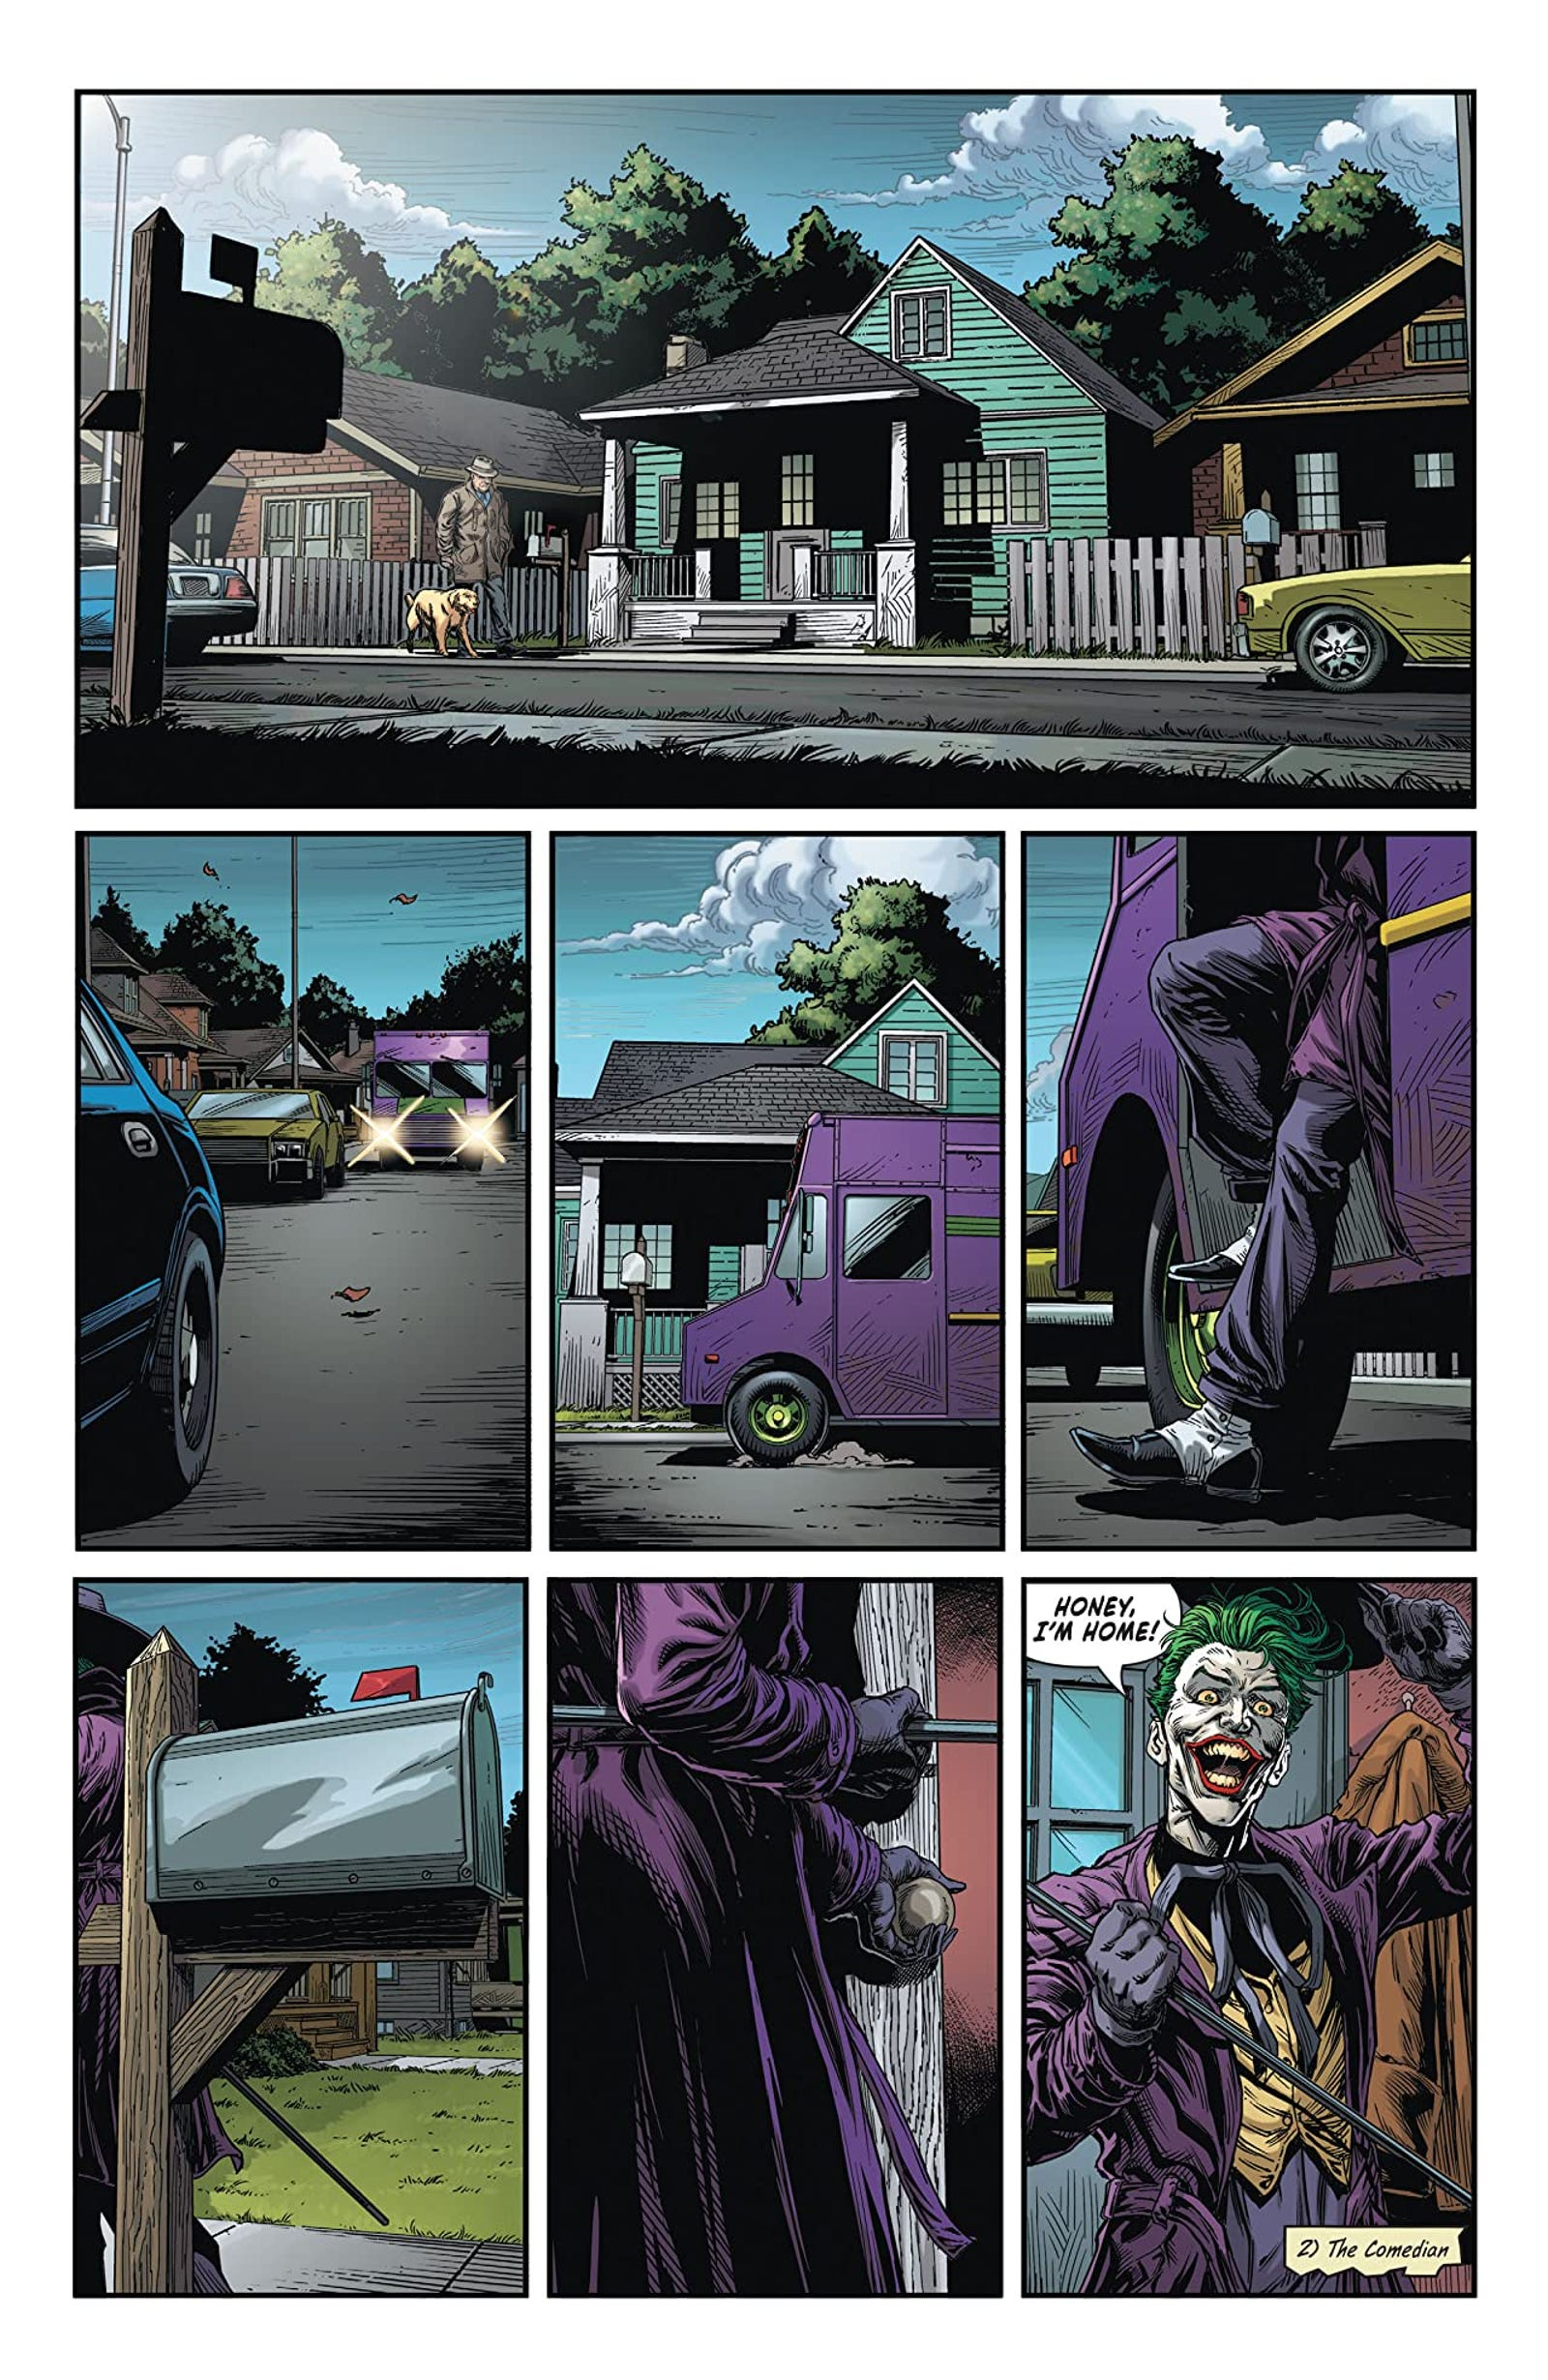 Batman: Three Jokers #2 art by Jason Fabok, Brad Anderson, and Rob Leigh